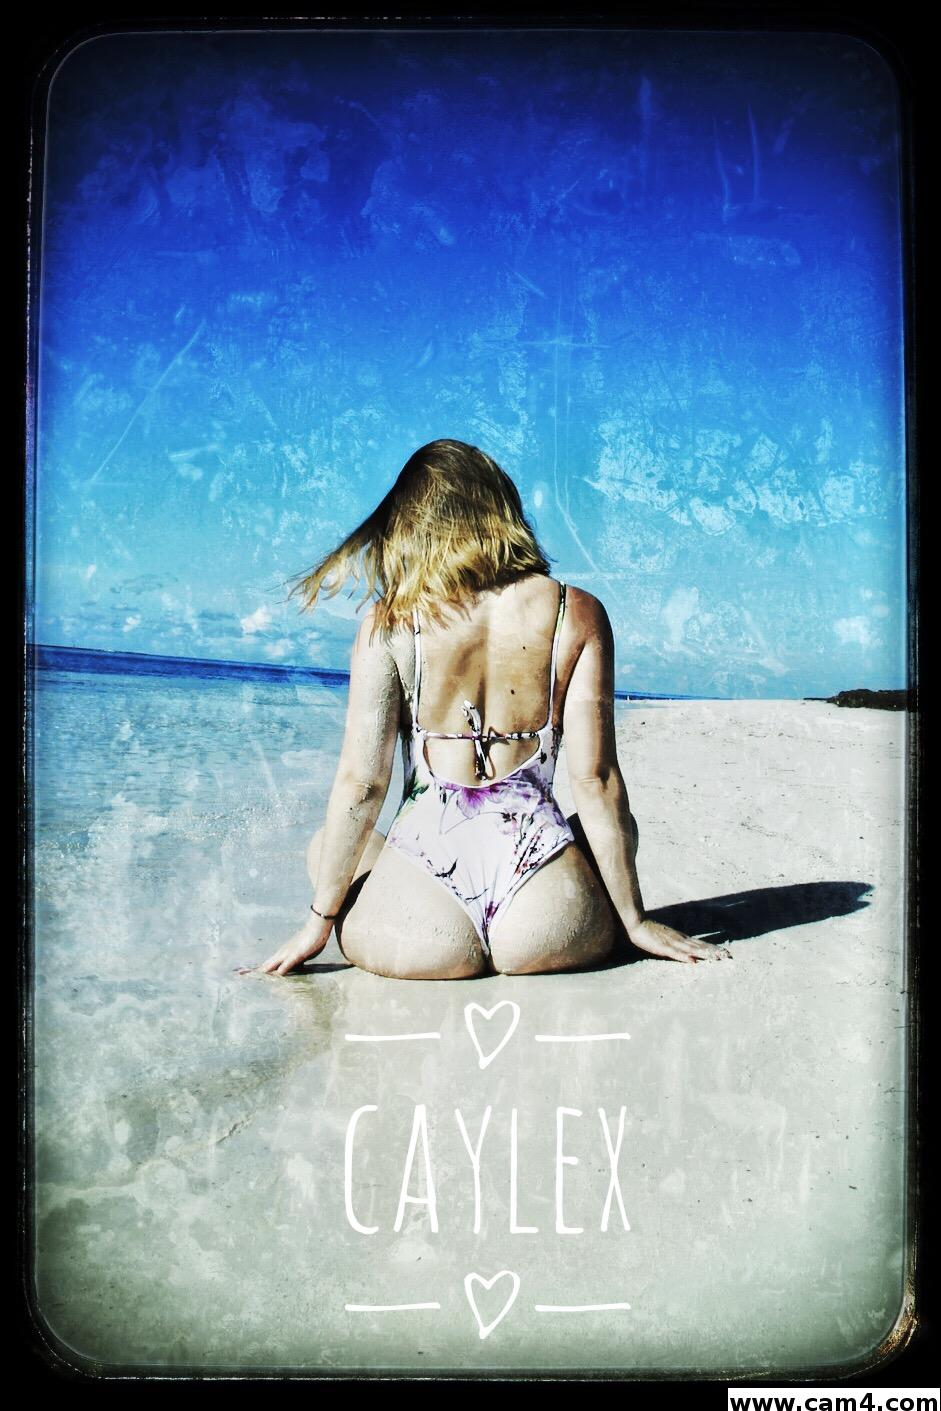 Caylex1?s=qdt8t5jwmegcz24lkv9n7t2h8re2i0ffr3xz1zhw4wi=